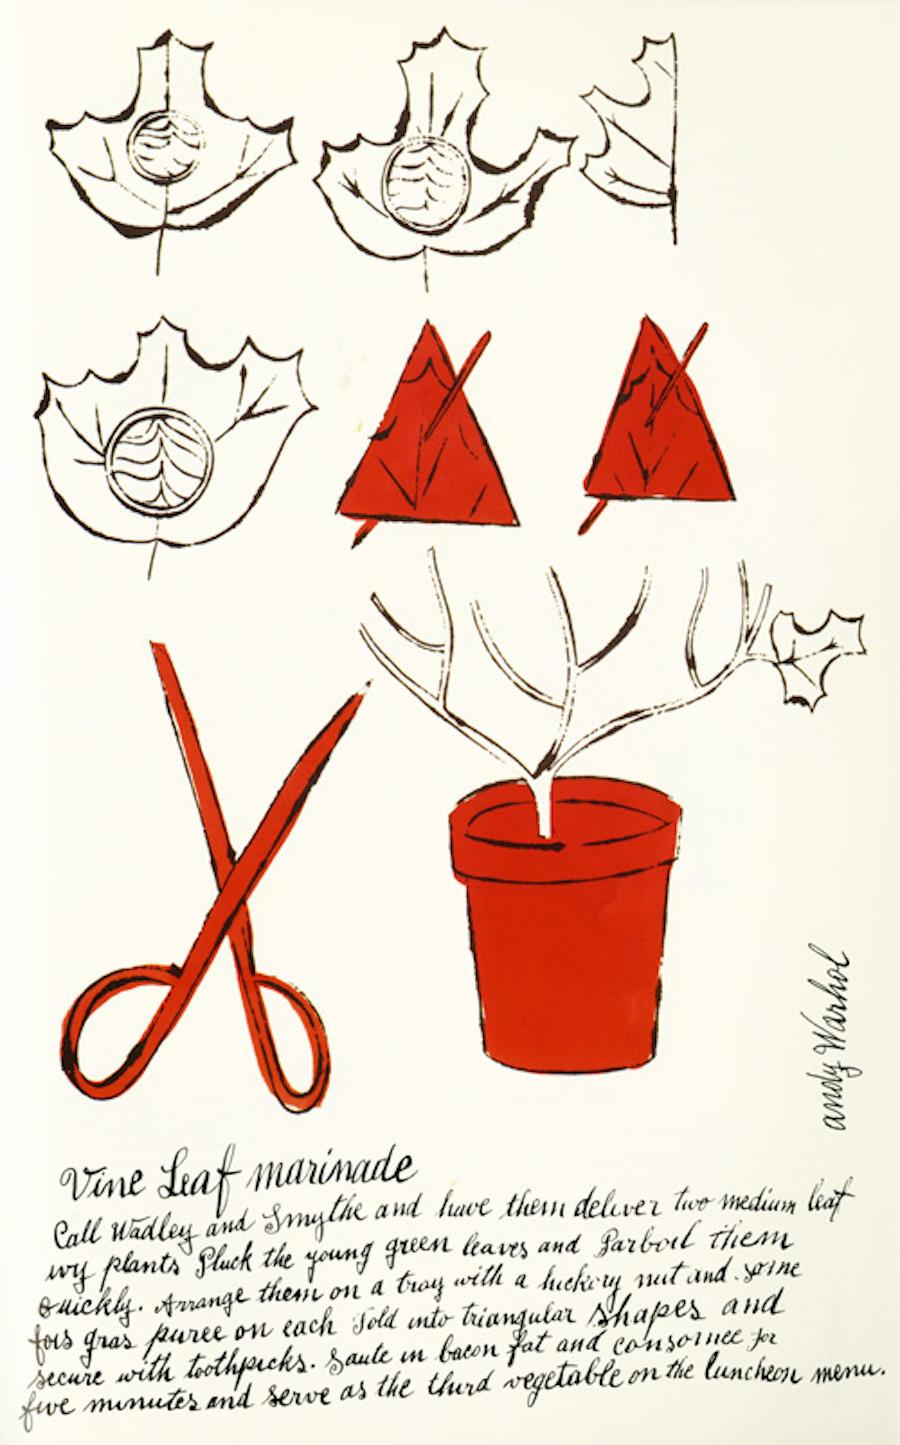 Vin Leaf Marinade by Andy Warhol